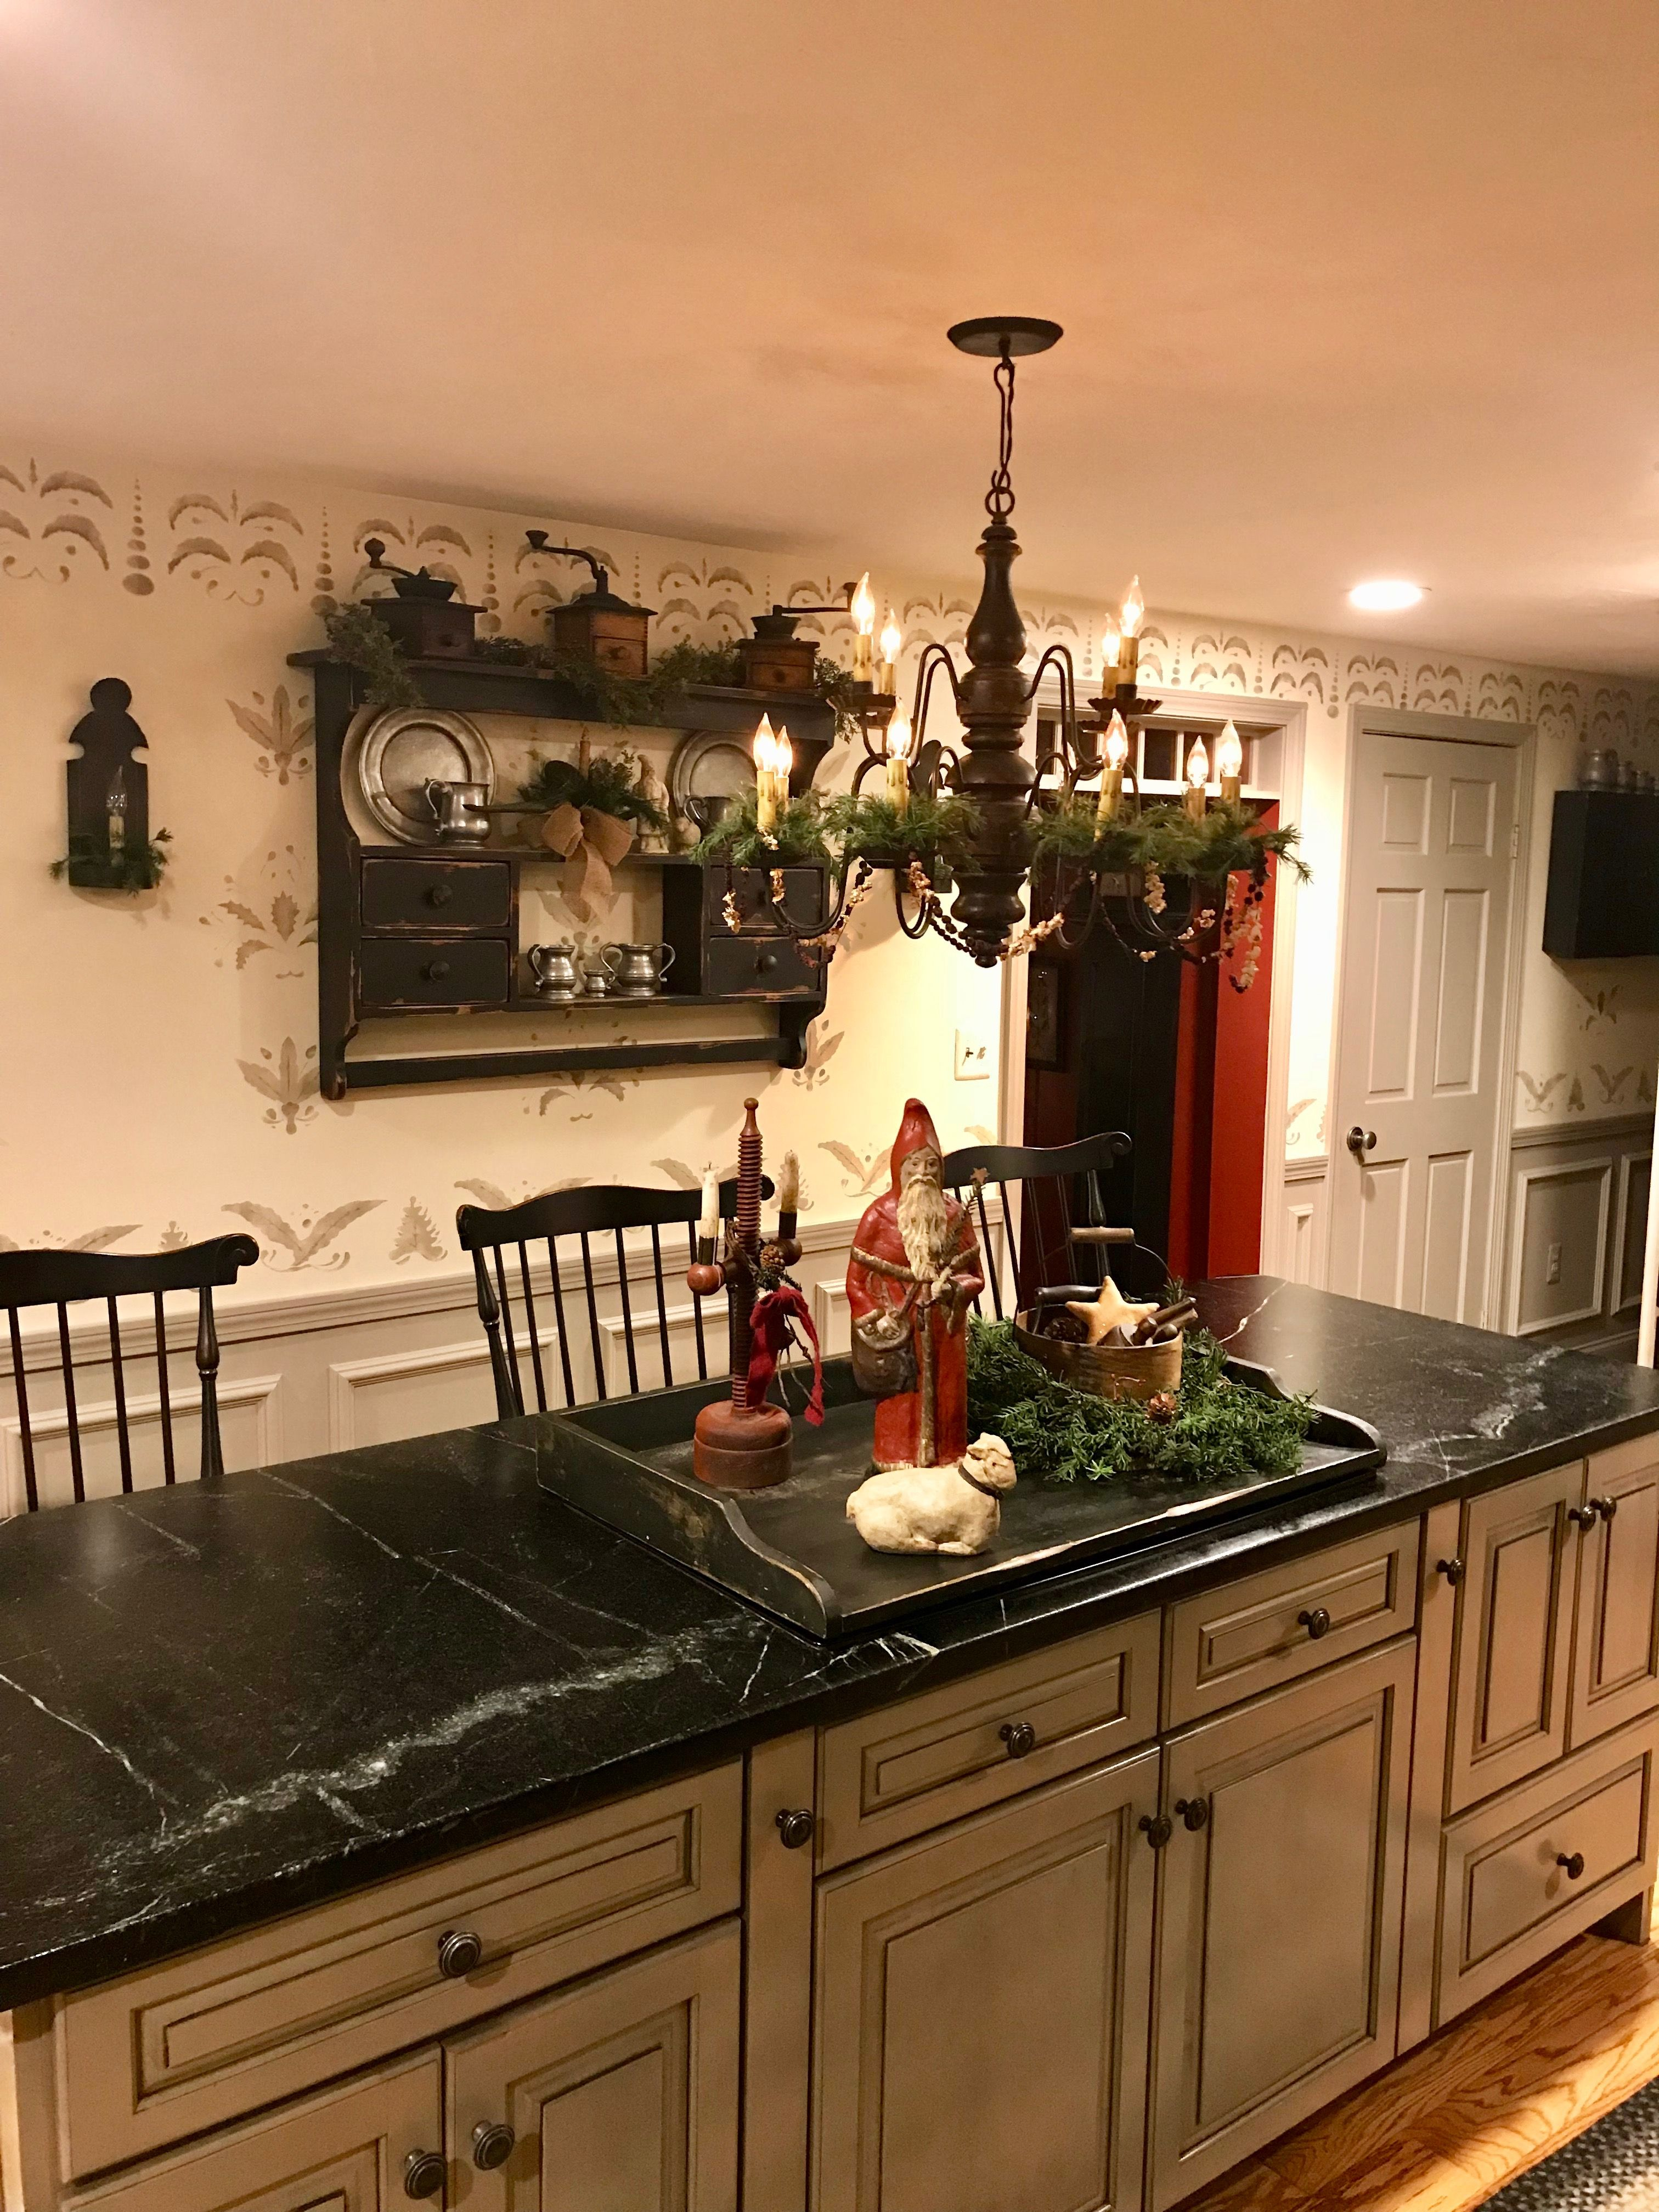 Pin de lisa strobel en Kitchen | Pinterest | Cocinas, Casas y Hogar